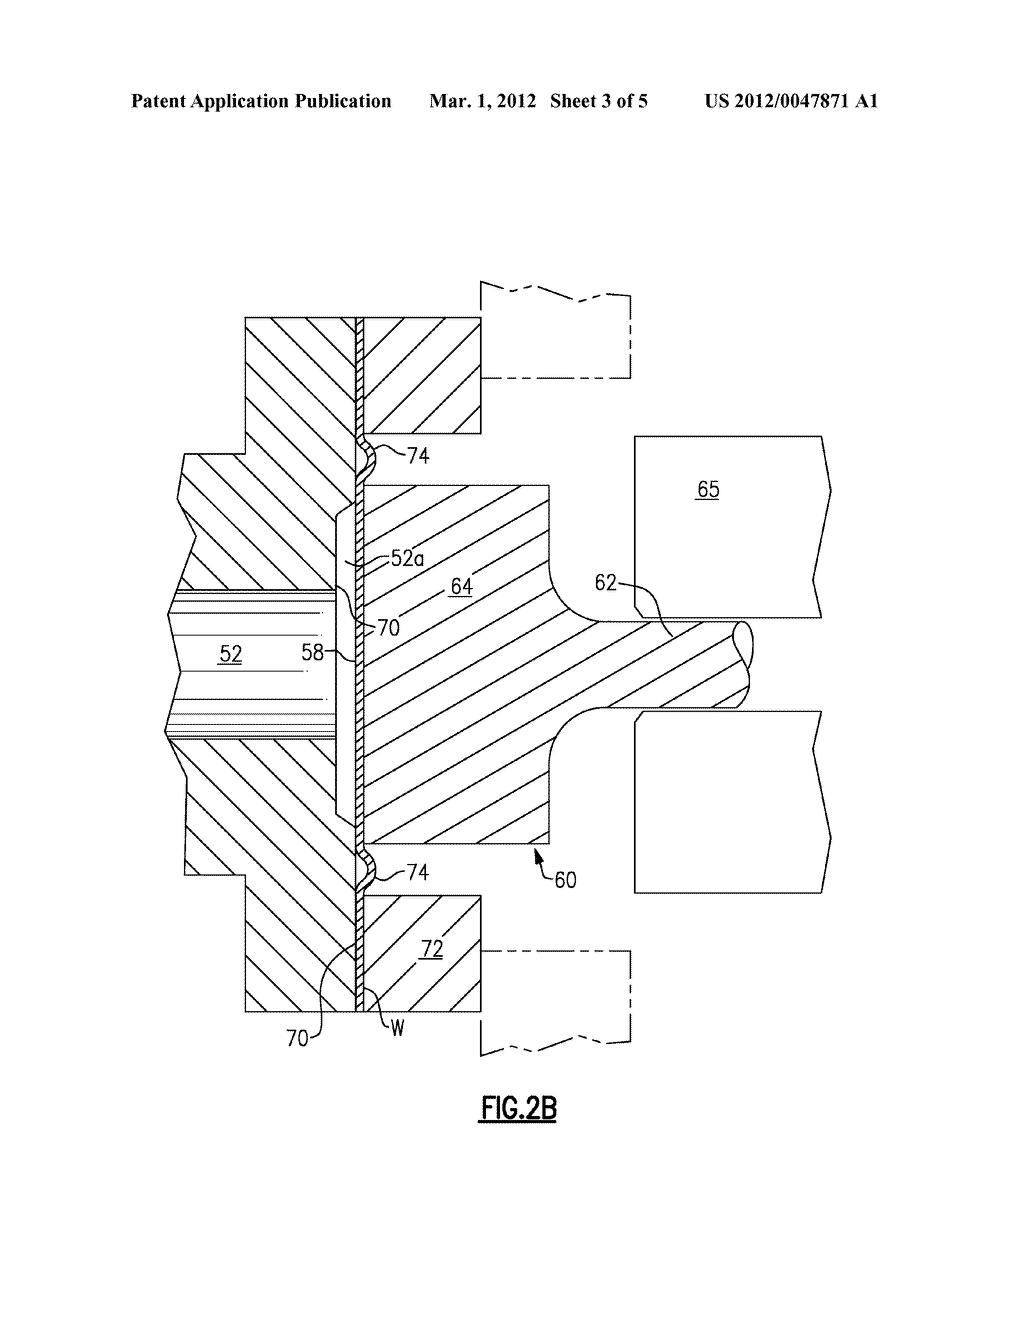 piezo resonance igniter and ignition method for propellant liquid